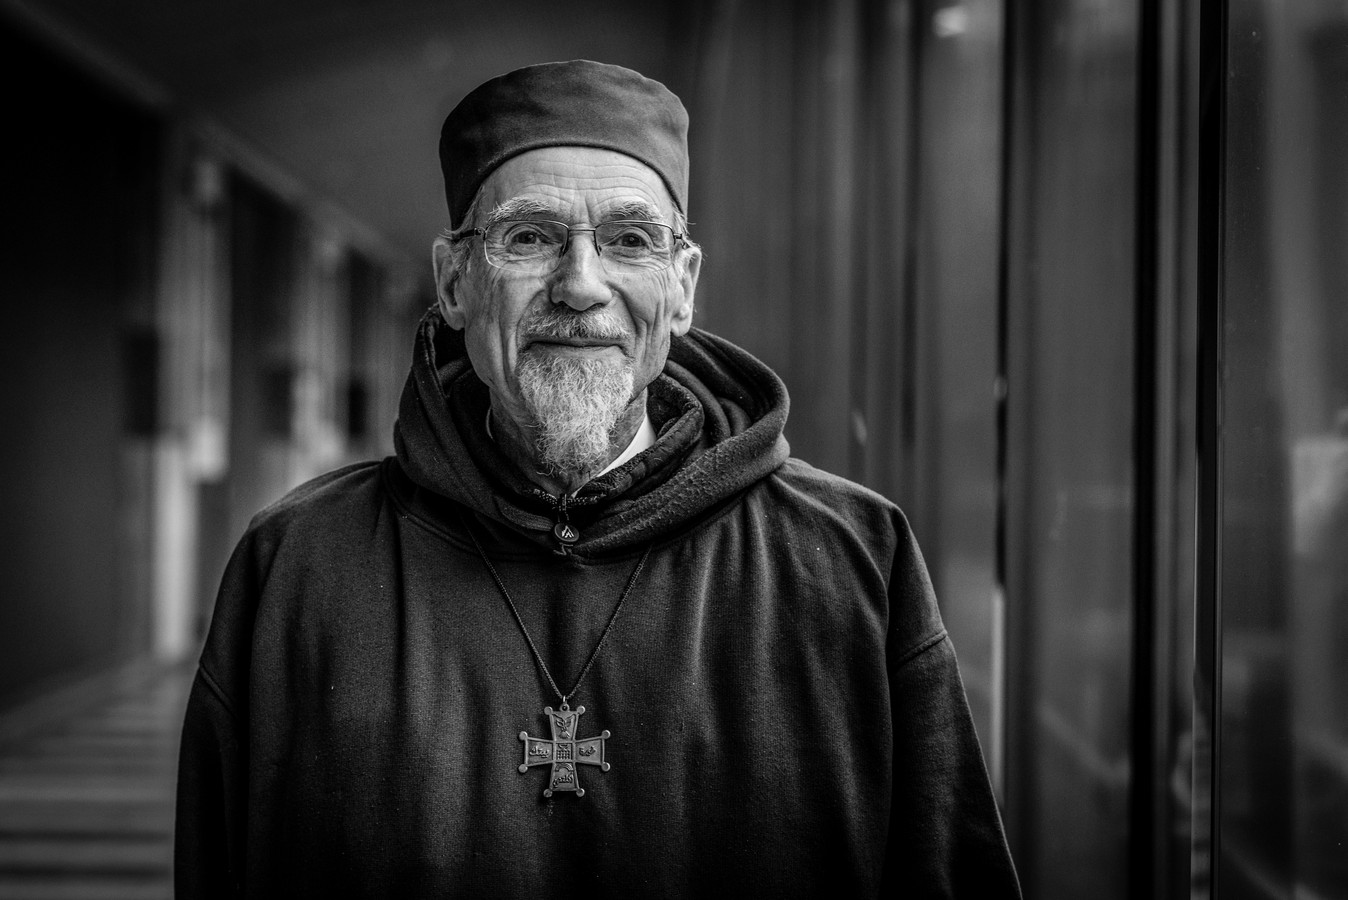 Pater Daniël Maes.